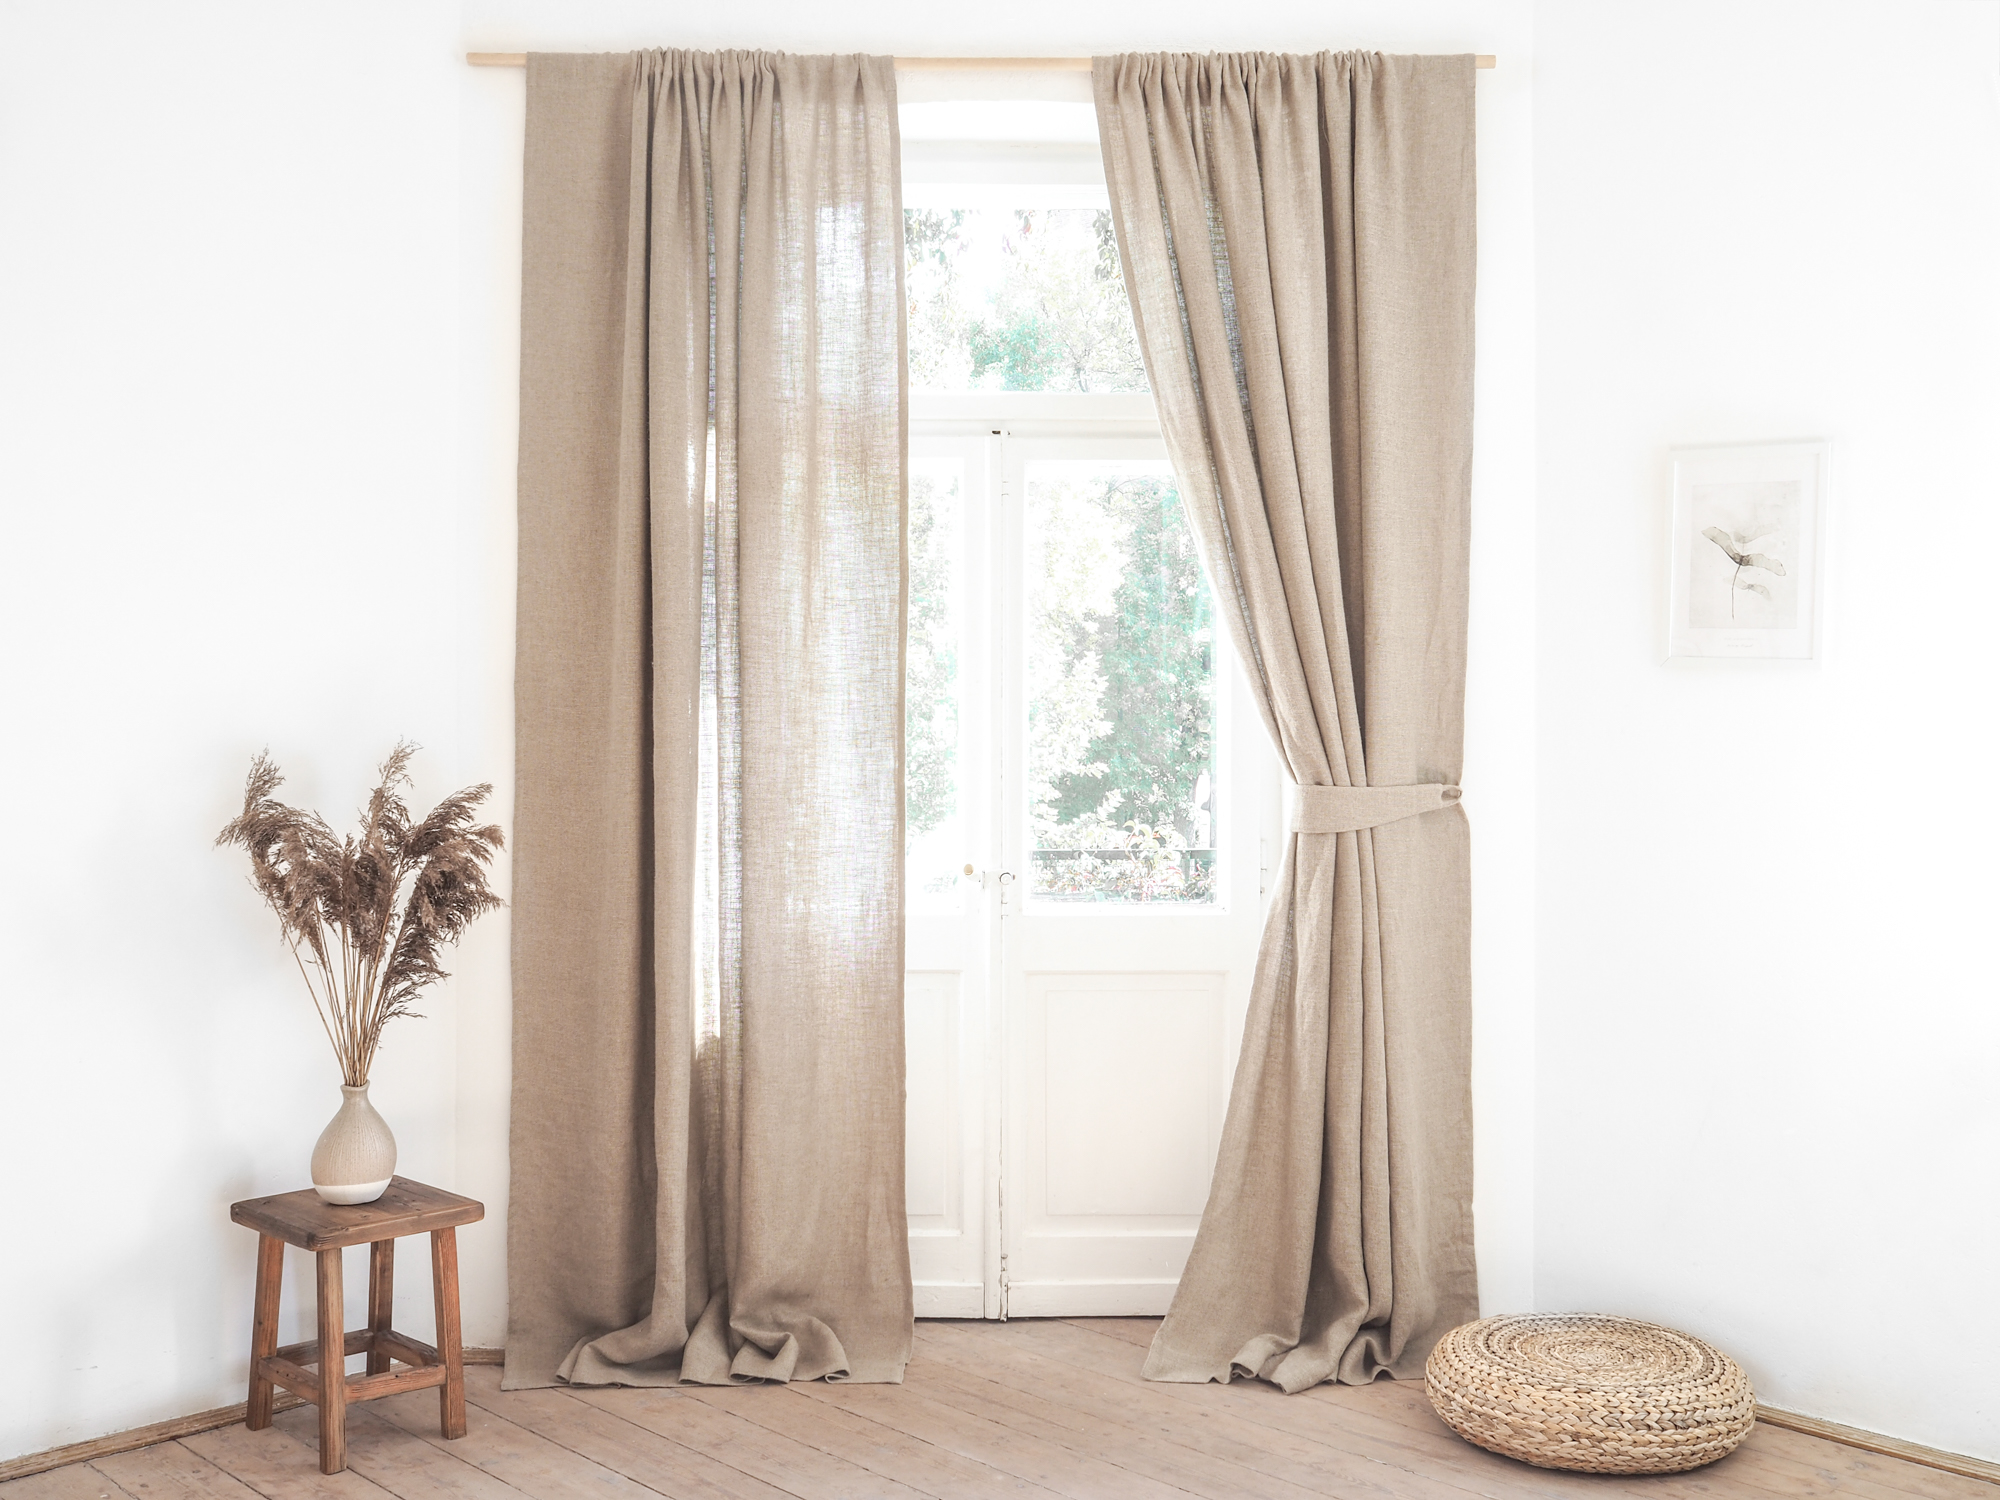 Linen burlap curtain tie backs